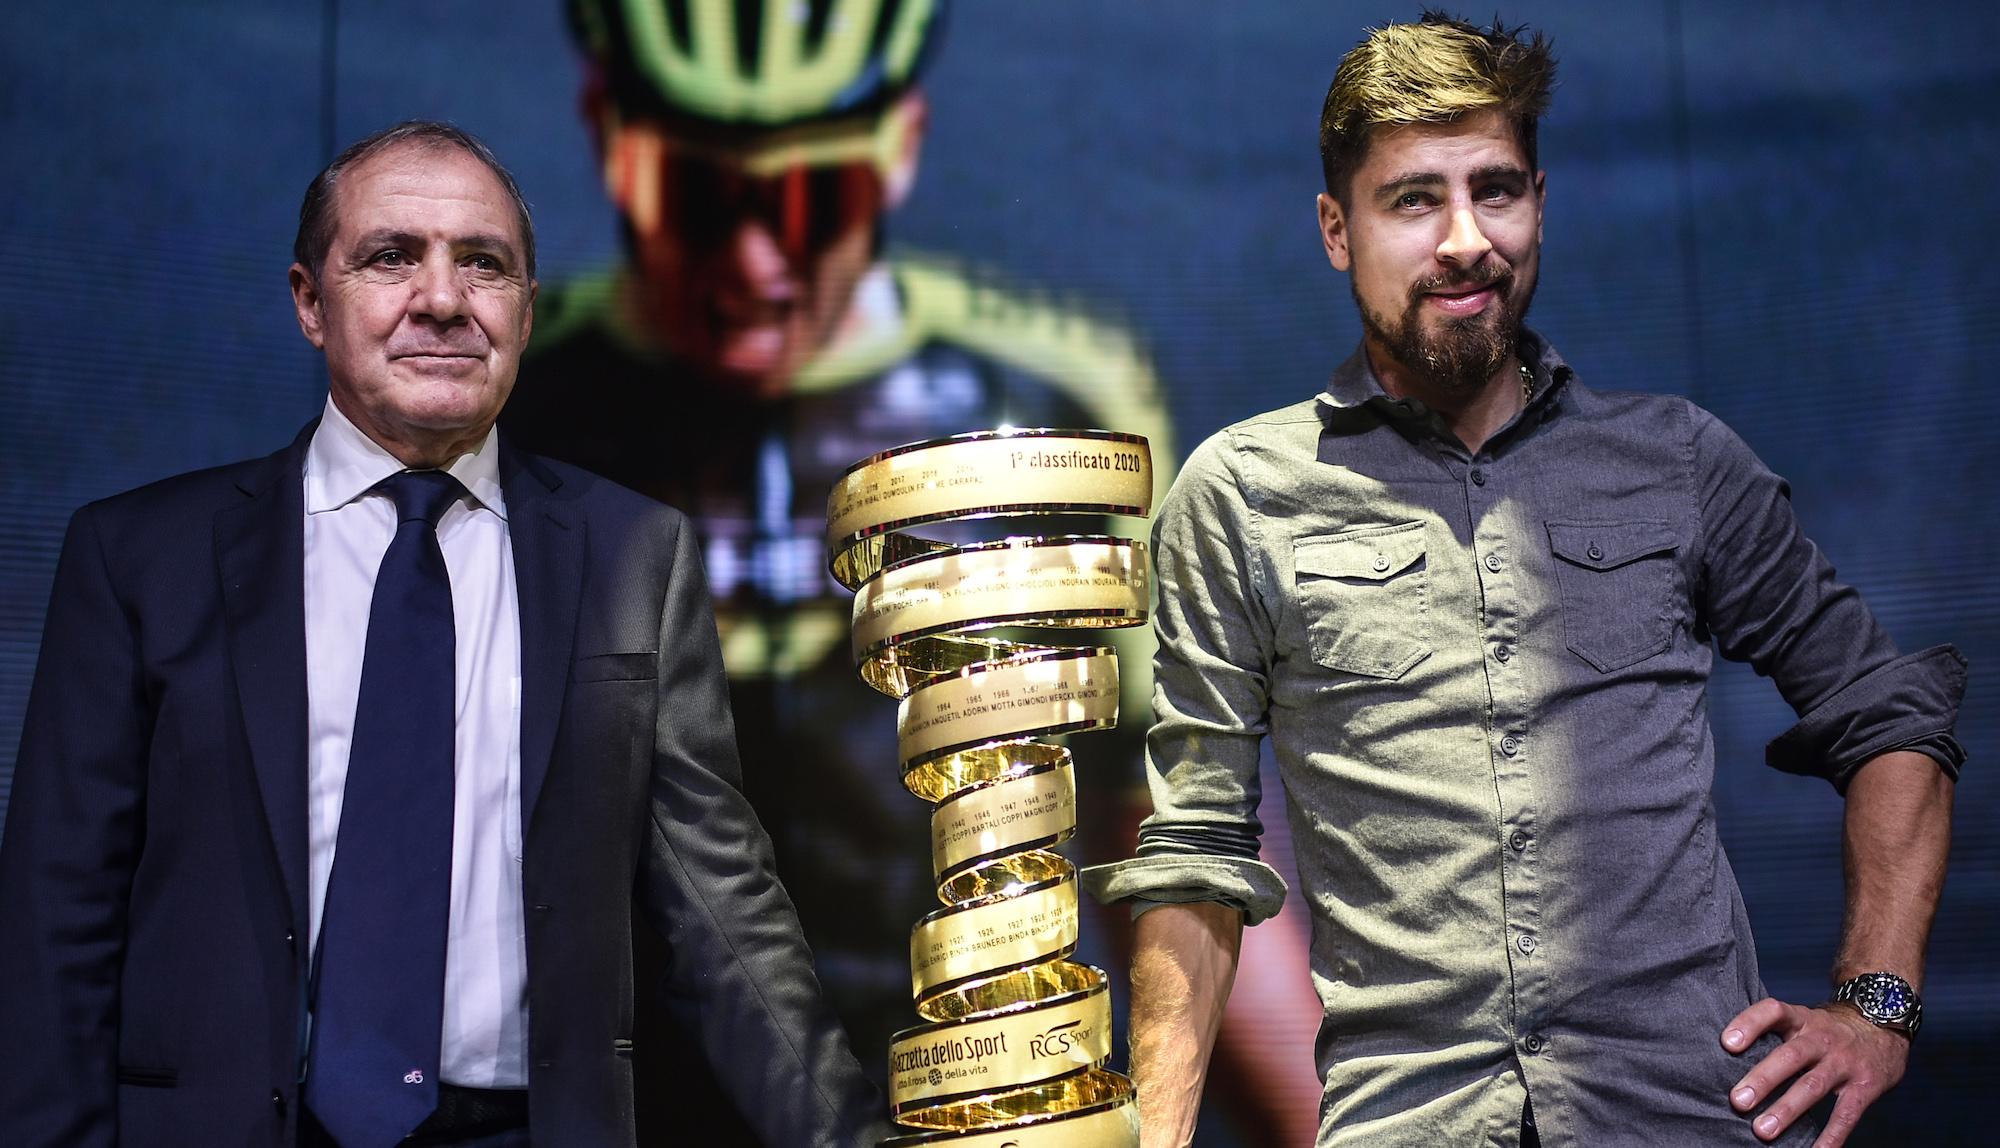 Giro d'Italia - cover